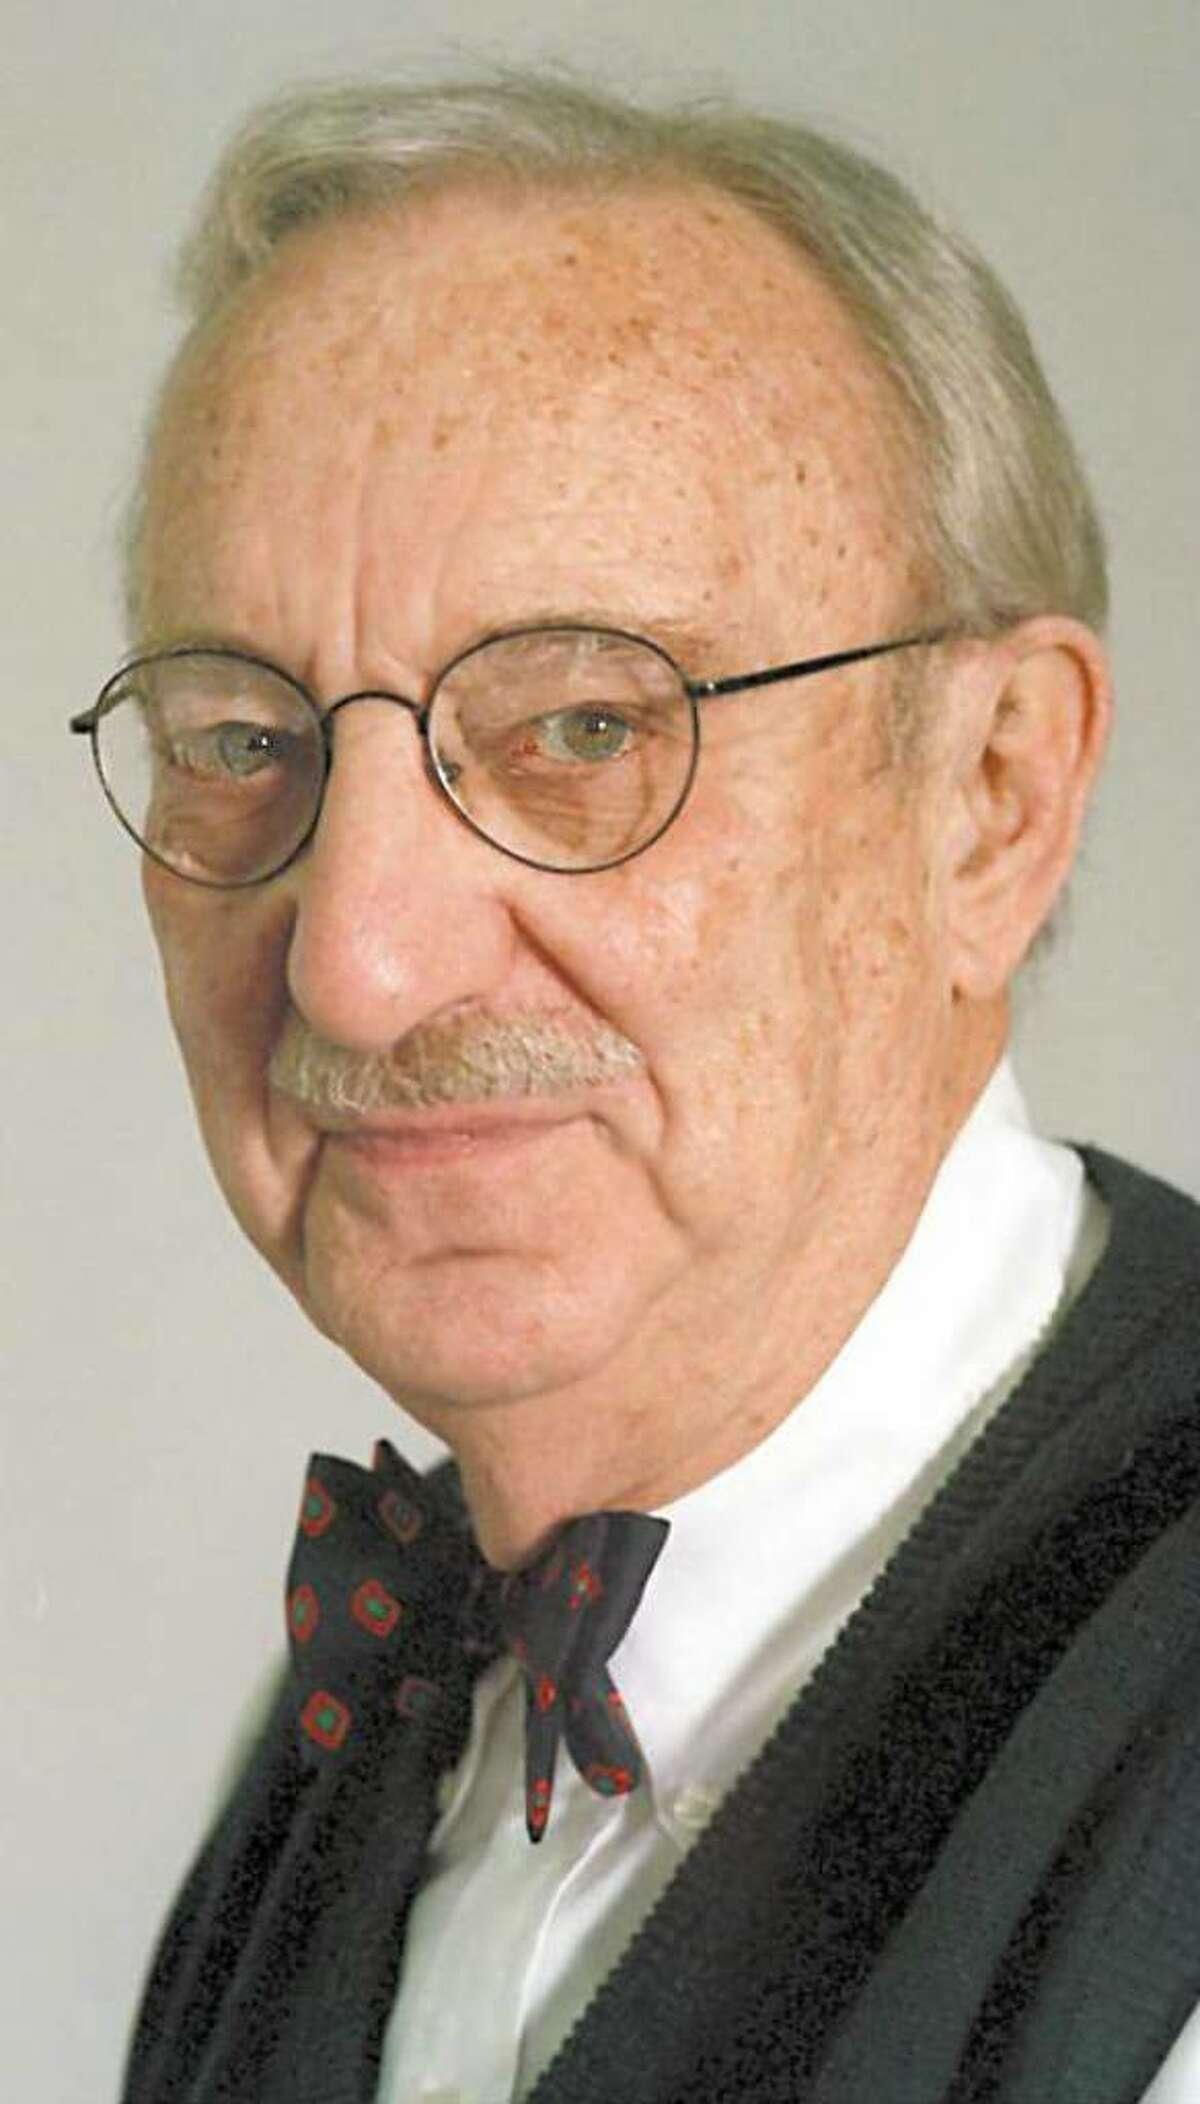 Bernie Yudain in 1996. Yudain, a treasured Greenwich newspaperman and community fixture, died Saturday.